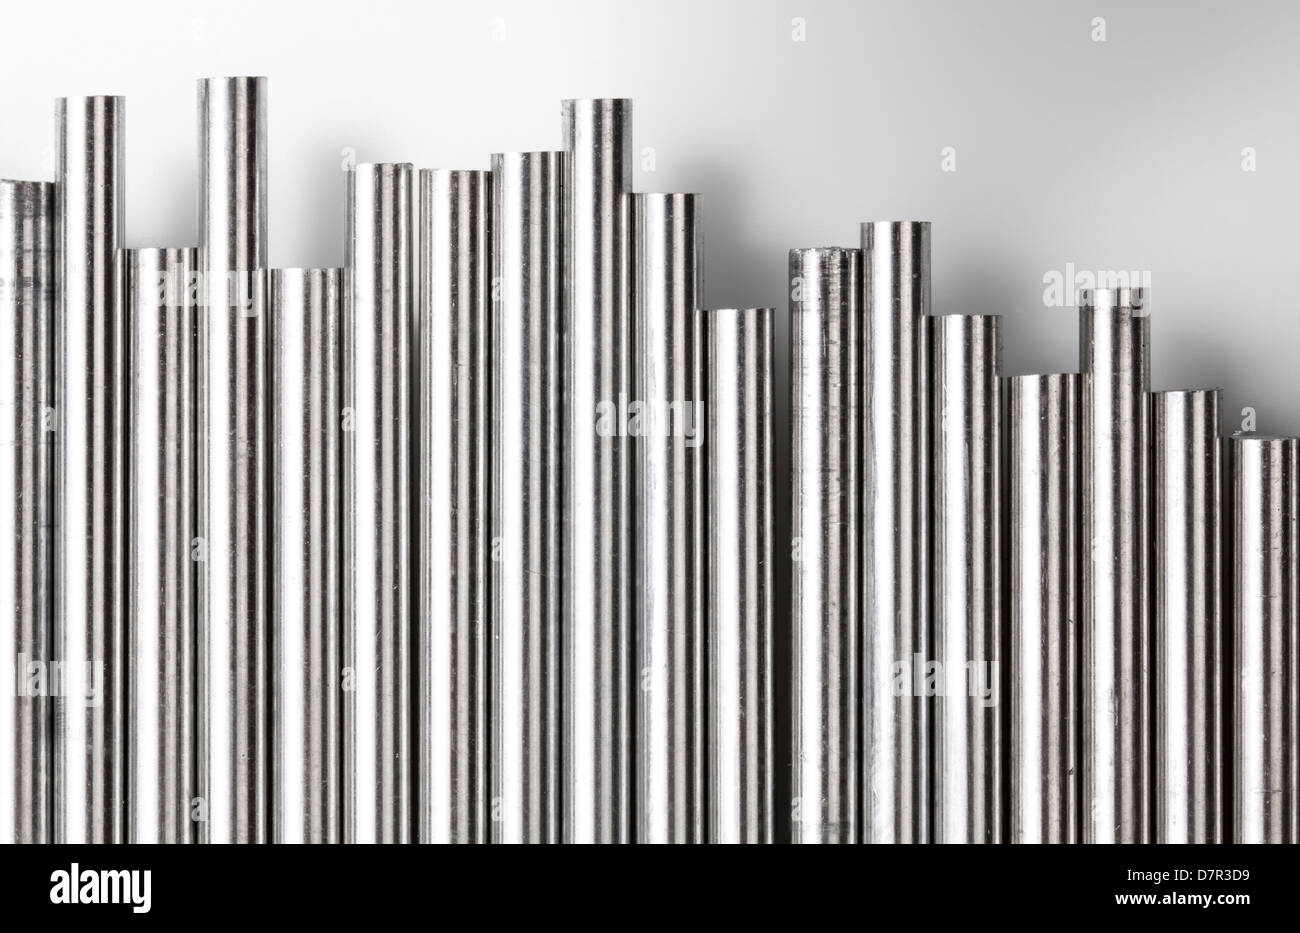 A stack of round bundled alumnium rods - Stock Image